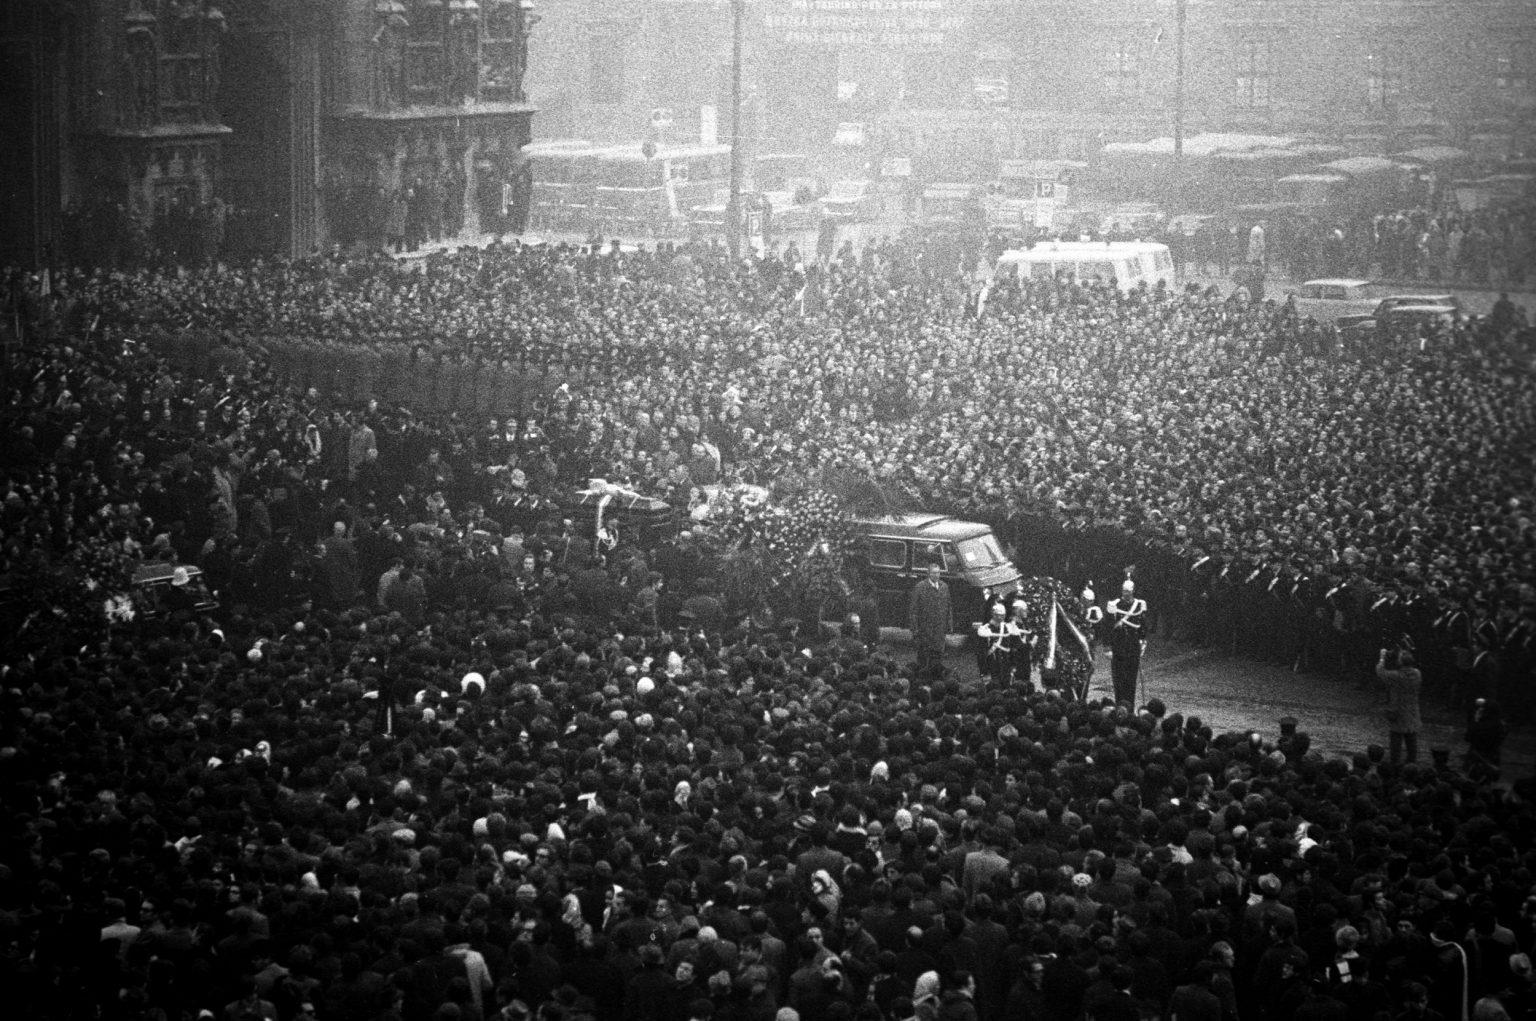 piazza-fontana-funerals-funerali